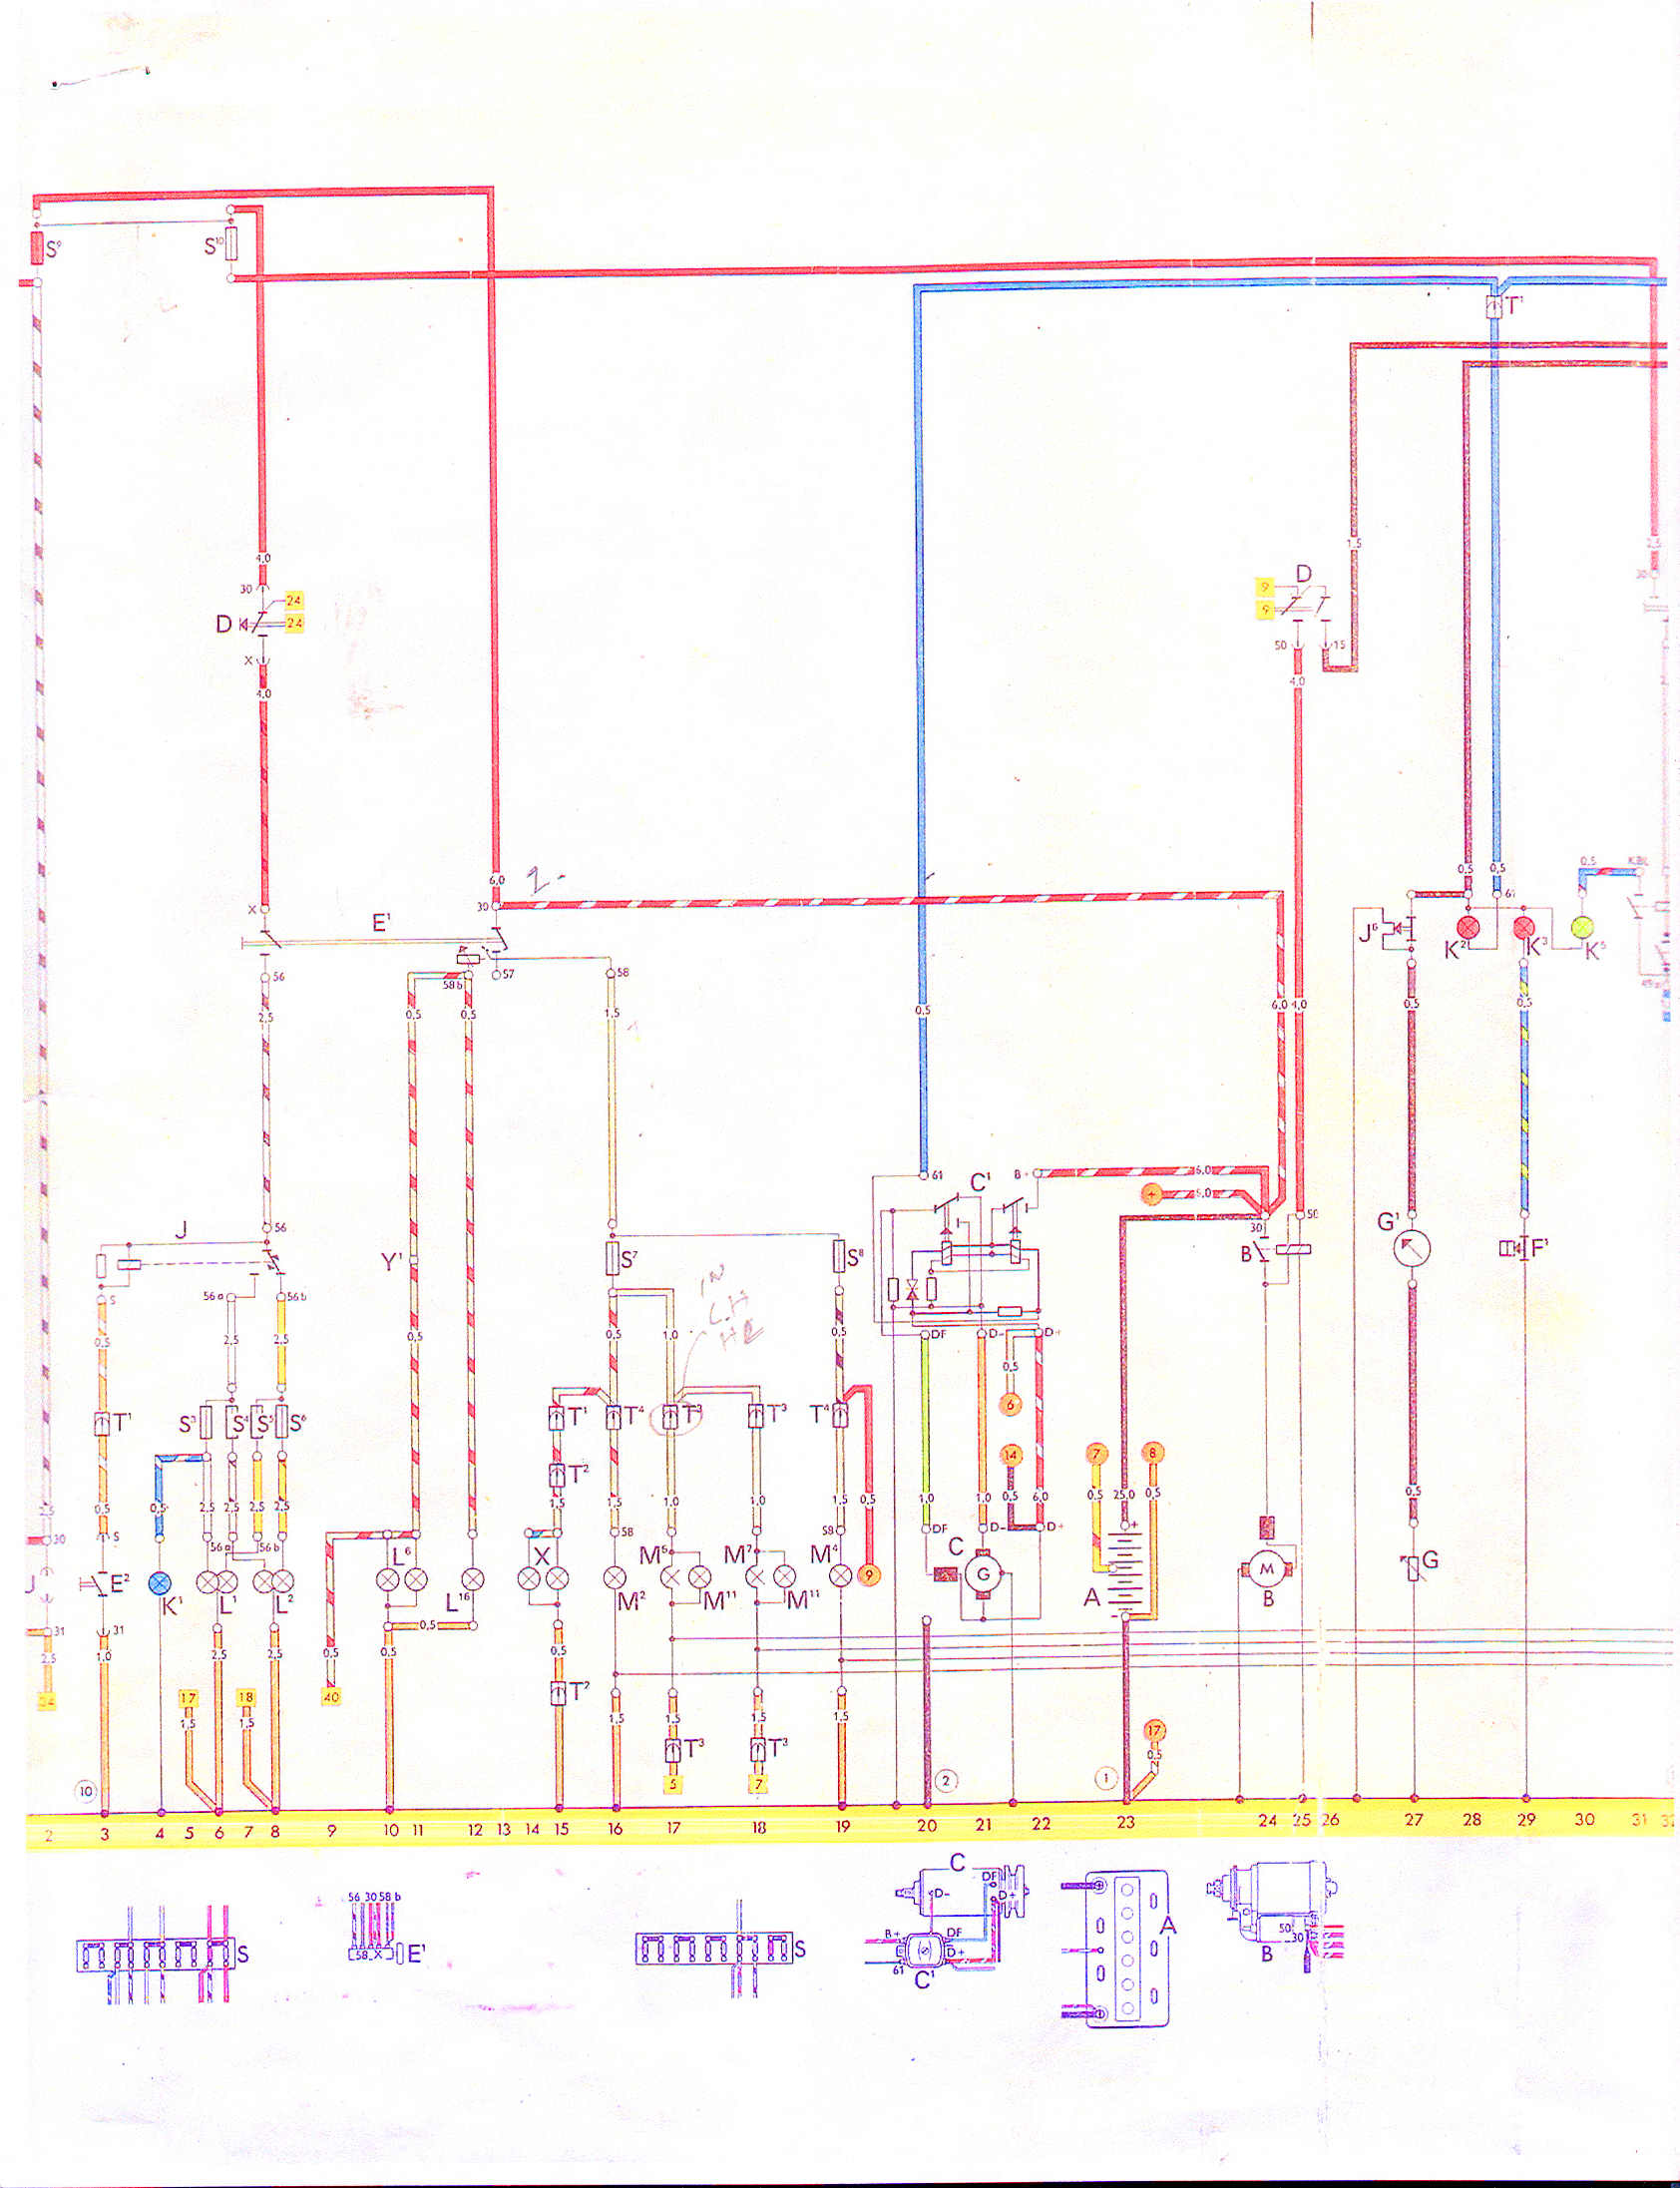 small resolution of wiring vw thing type 181 restoration vw engine wiring diagram 1973 vw thing wiring diagram